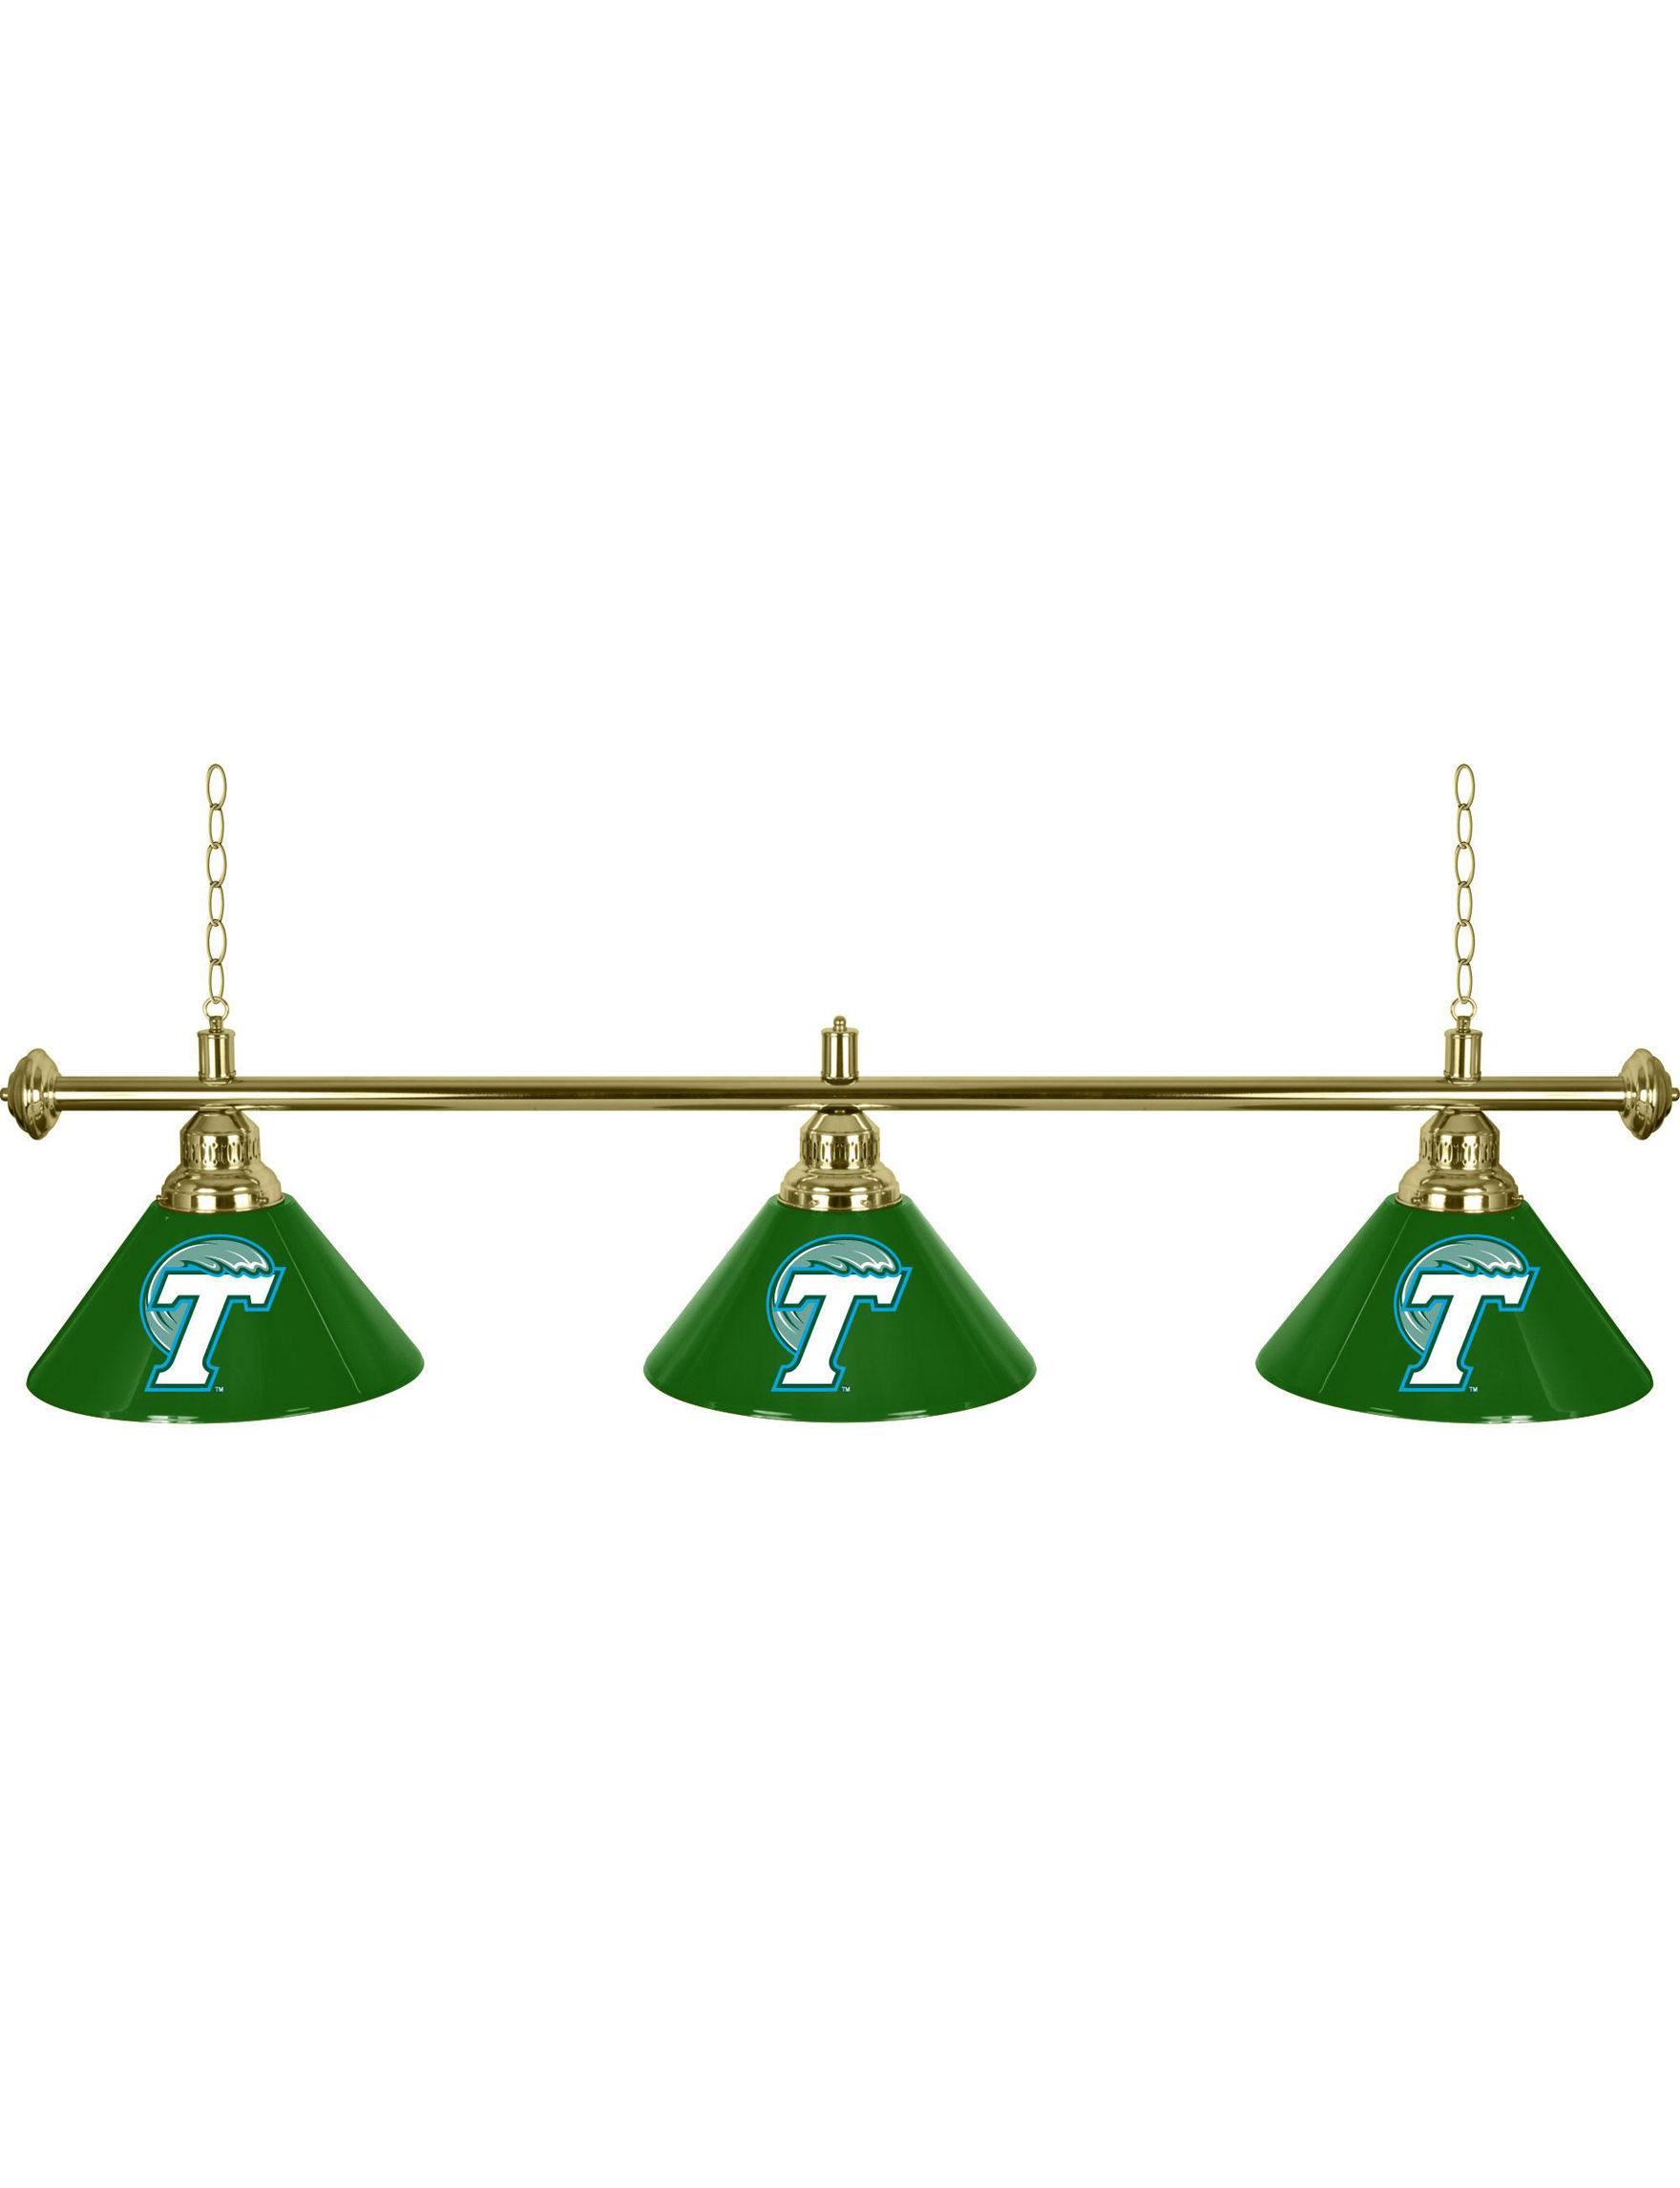 NCAA Green Lighting & Lamps NCAA